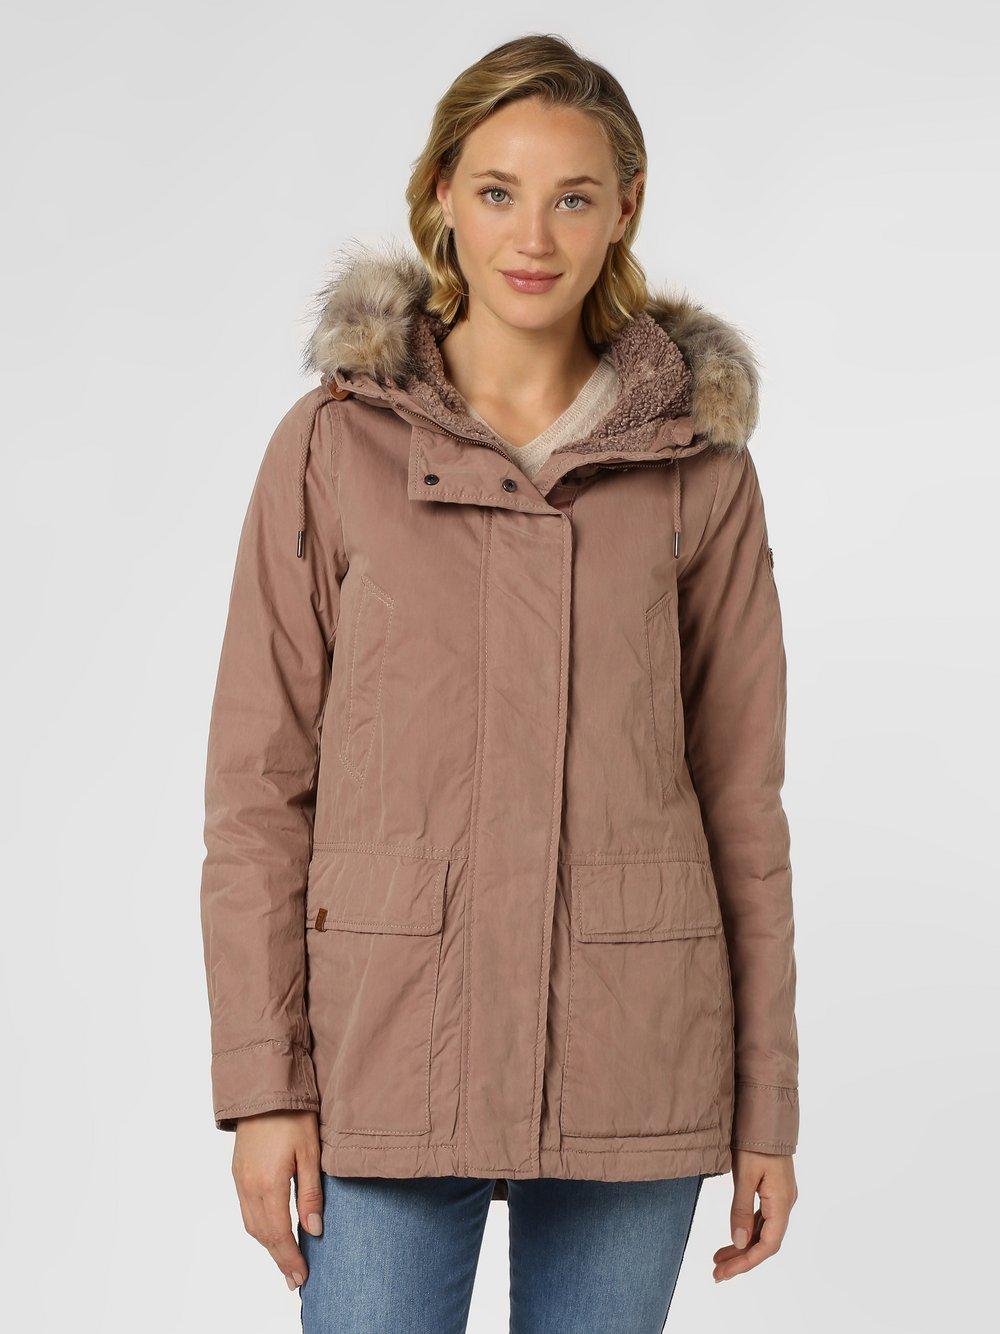 Camel Active – Kurtka damska, różowy Van Graaf 456134-0001